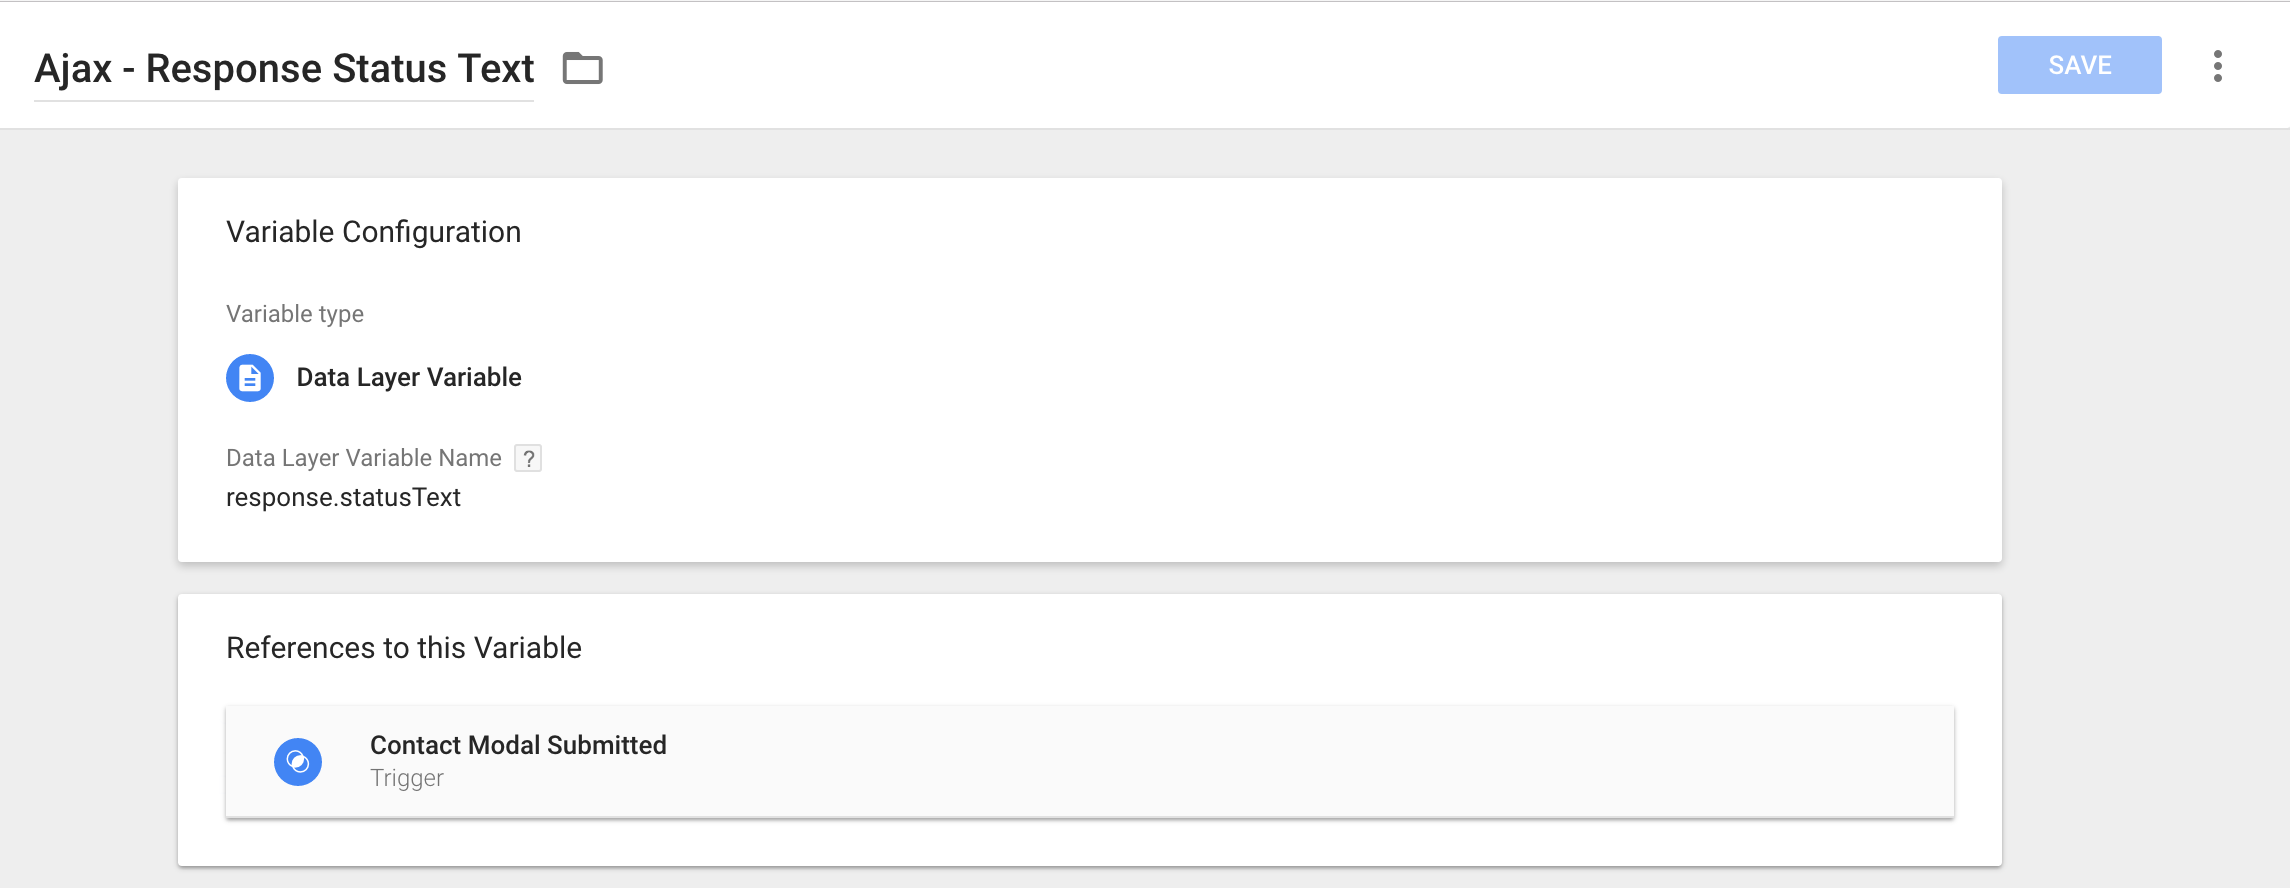 Ajax Response Status Text.png